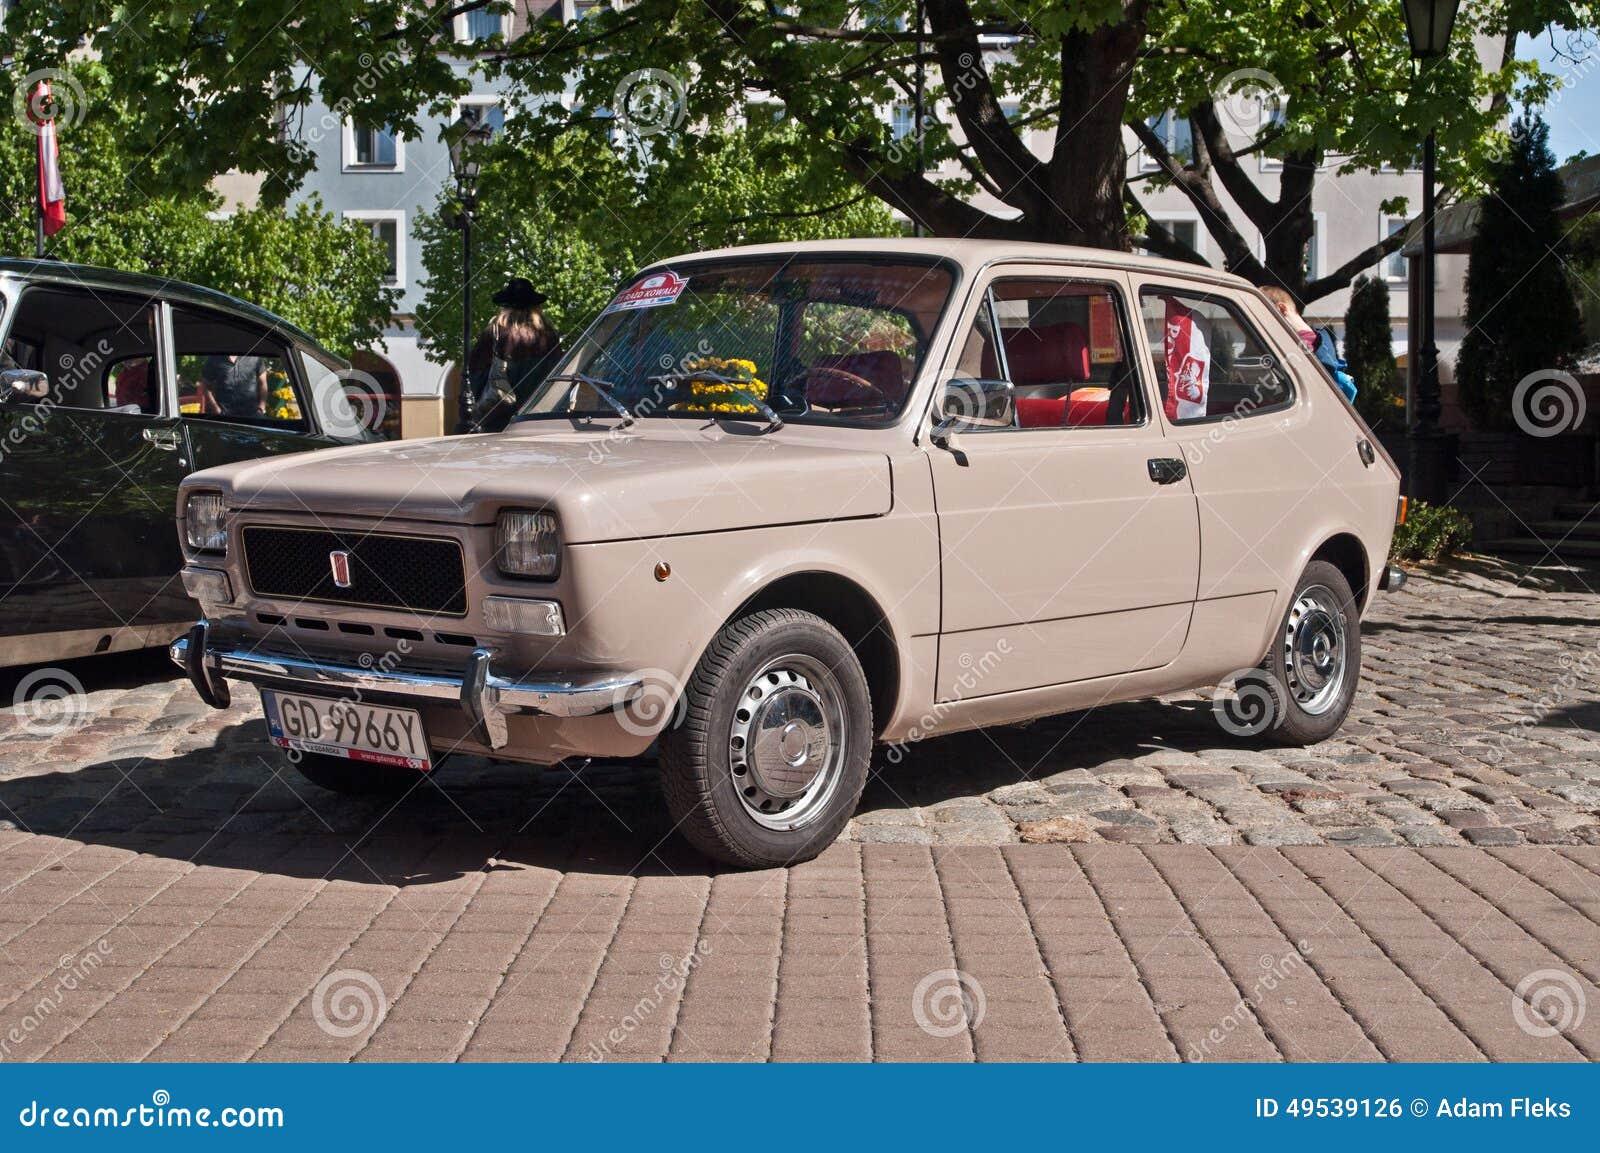 Fiat fiat 127 : Vintage Car Fiat 127 Parked Editorial Photo - Image of oldtimer ...